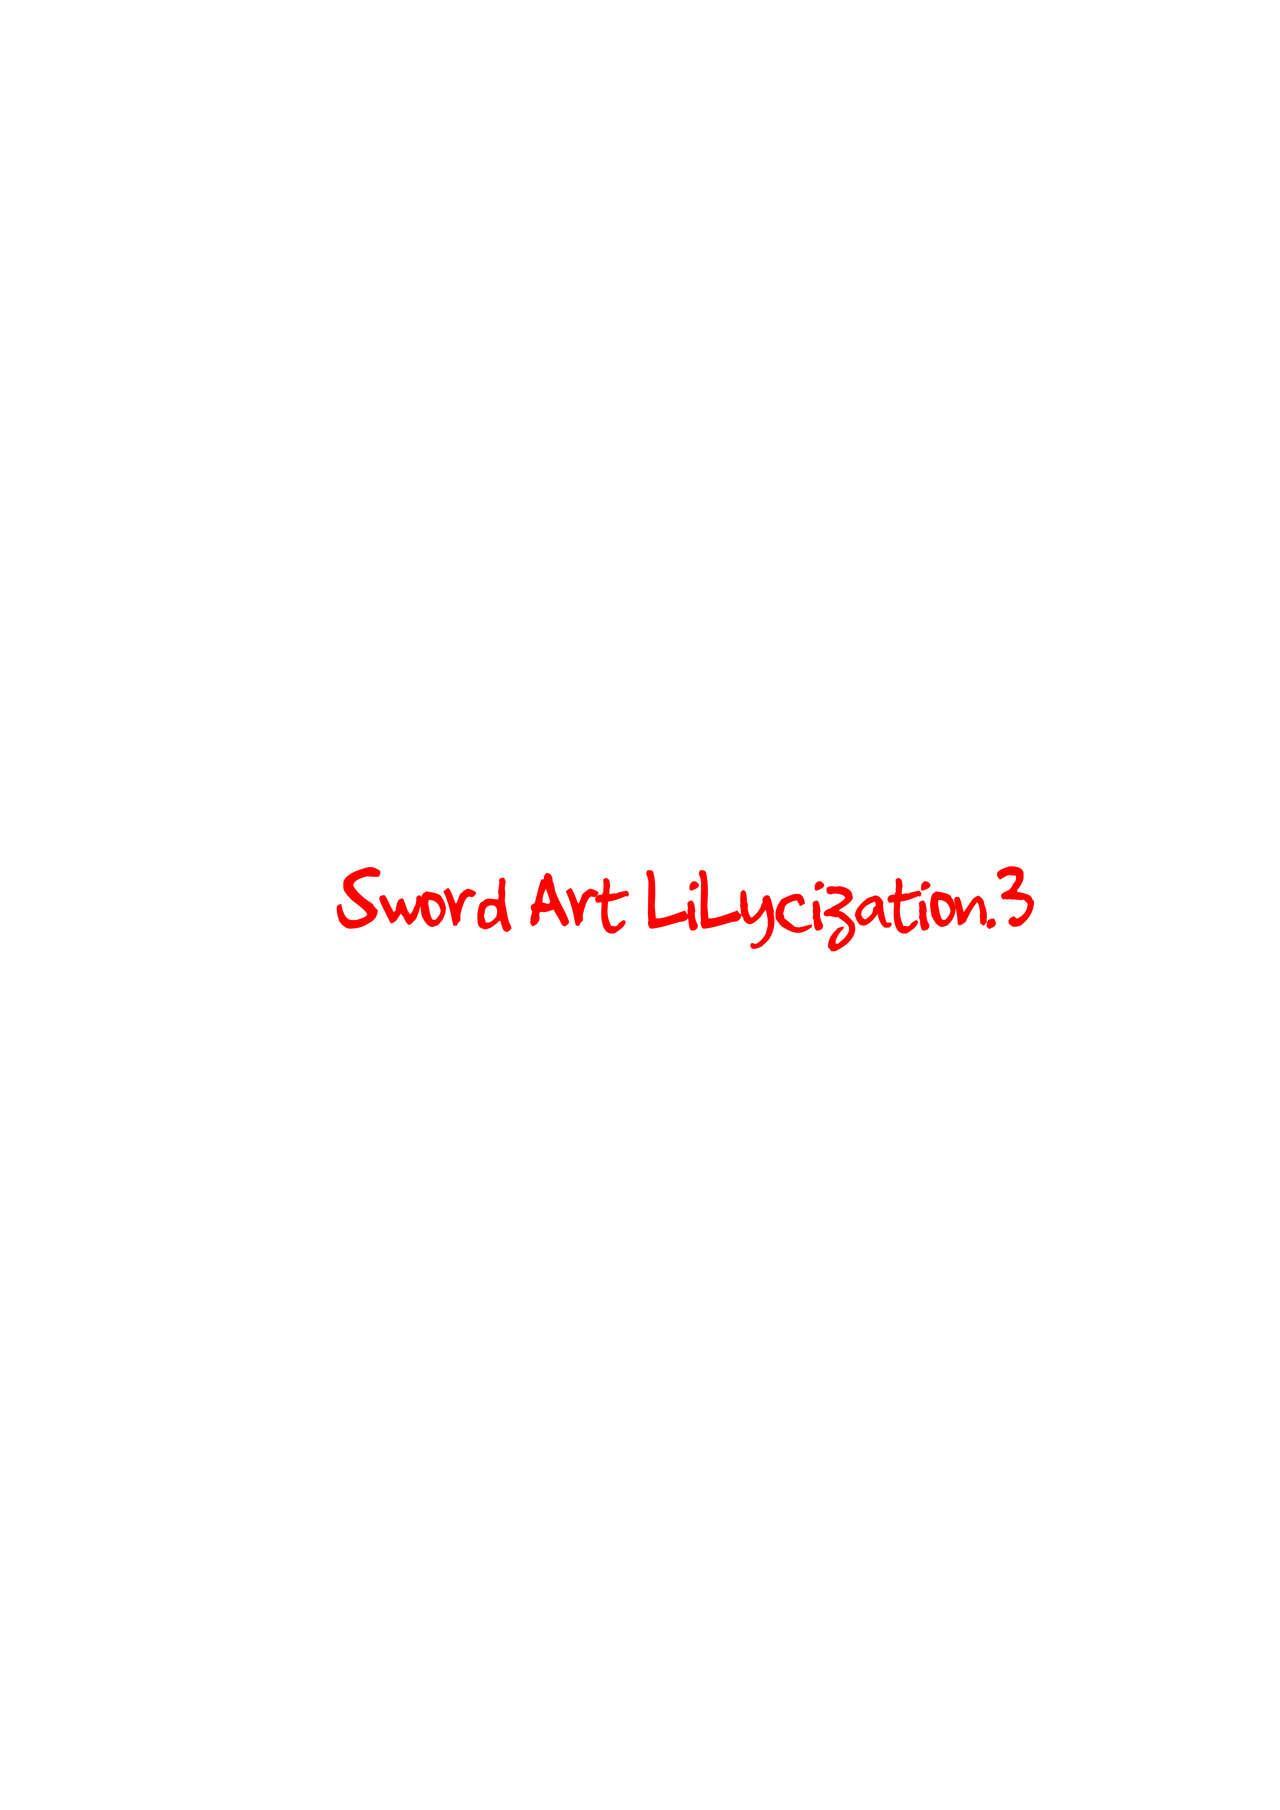 Sword Art Lilycization.3 1